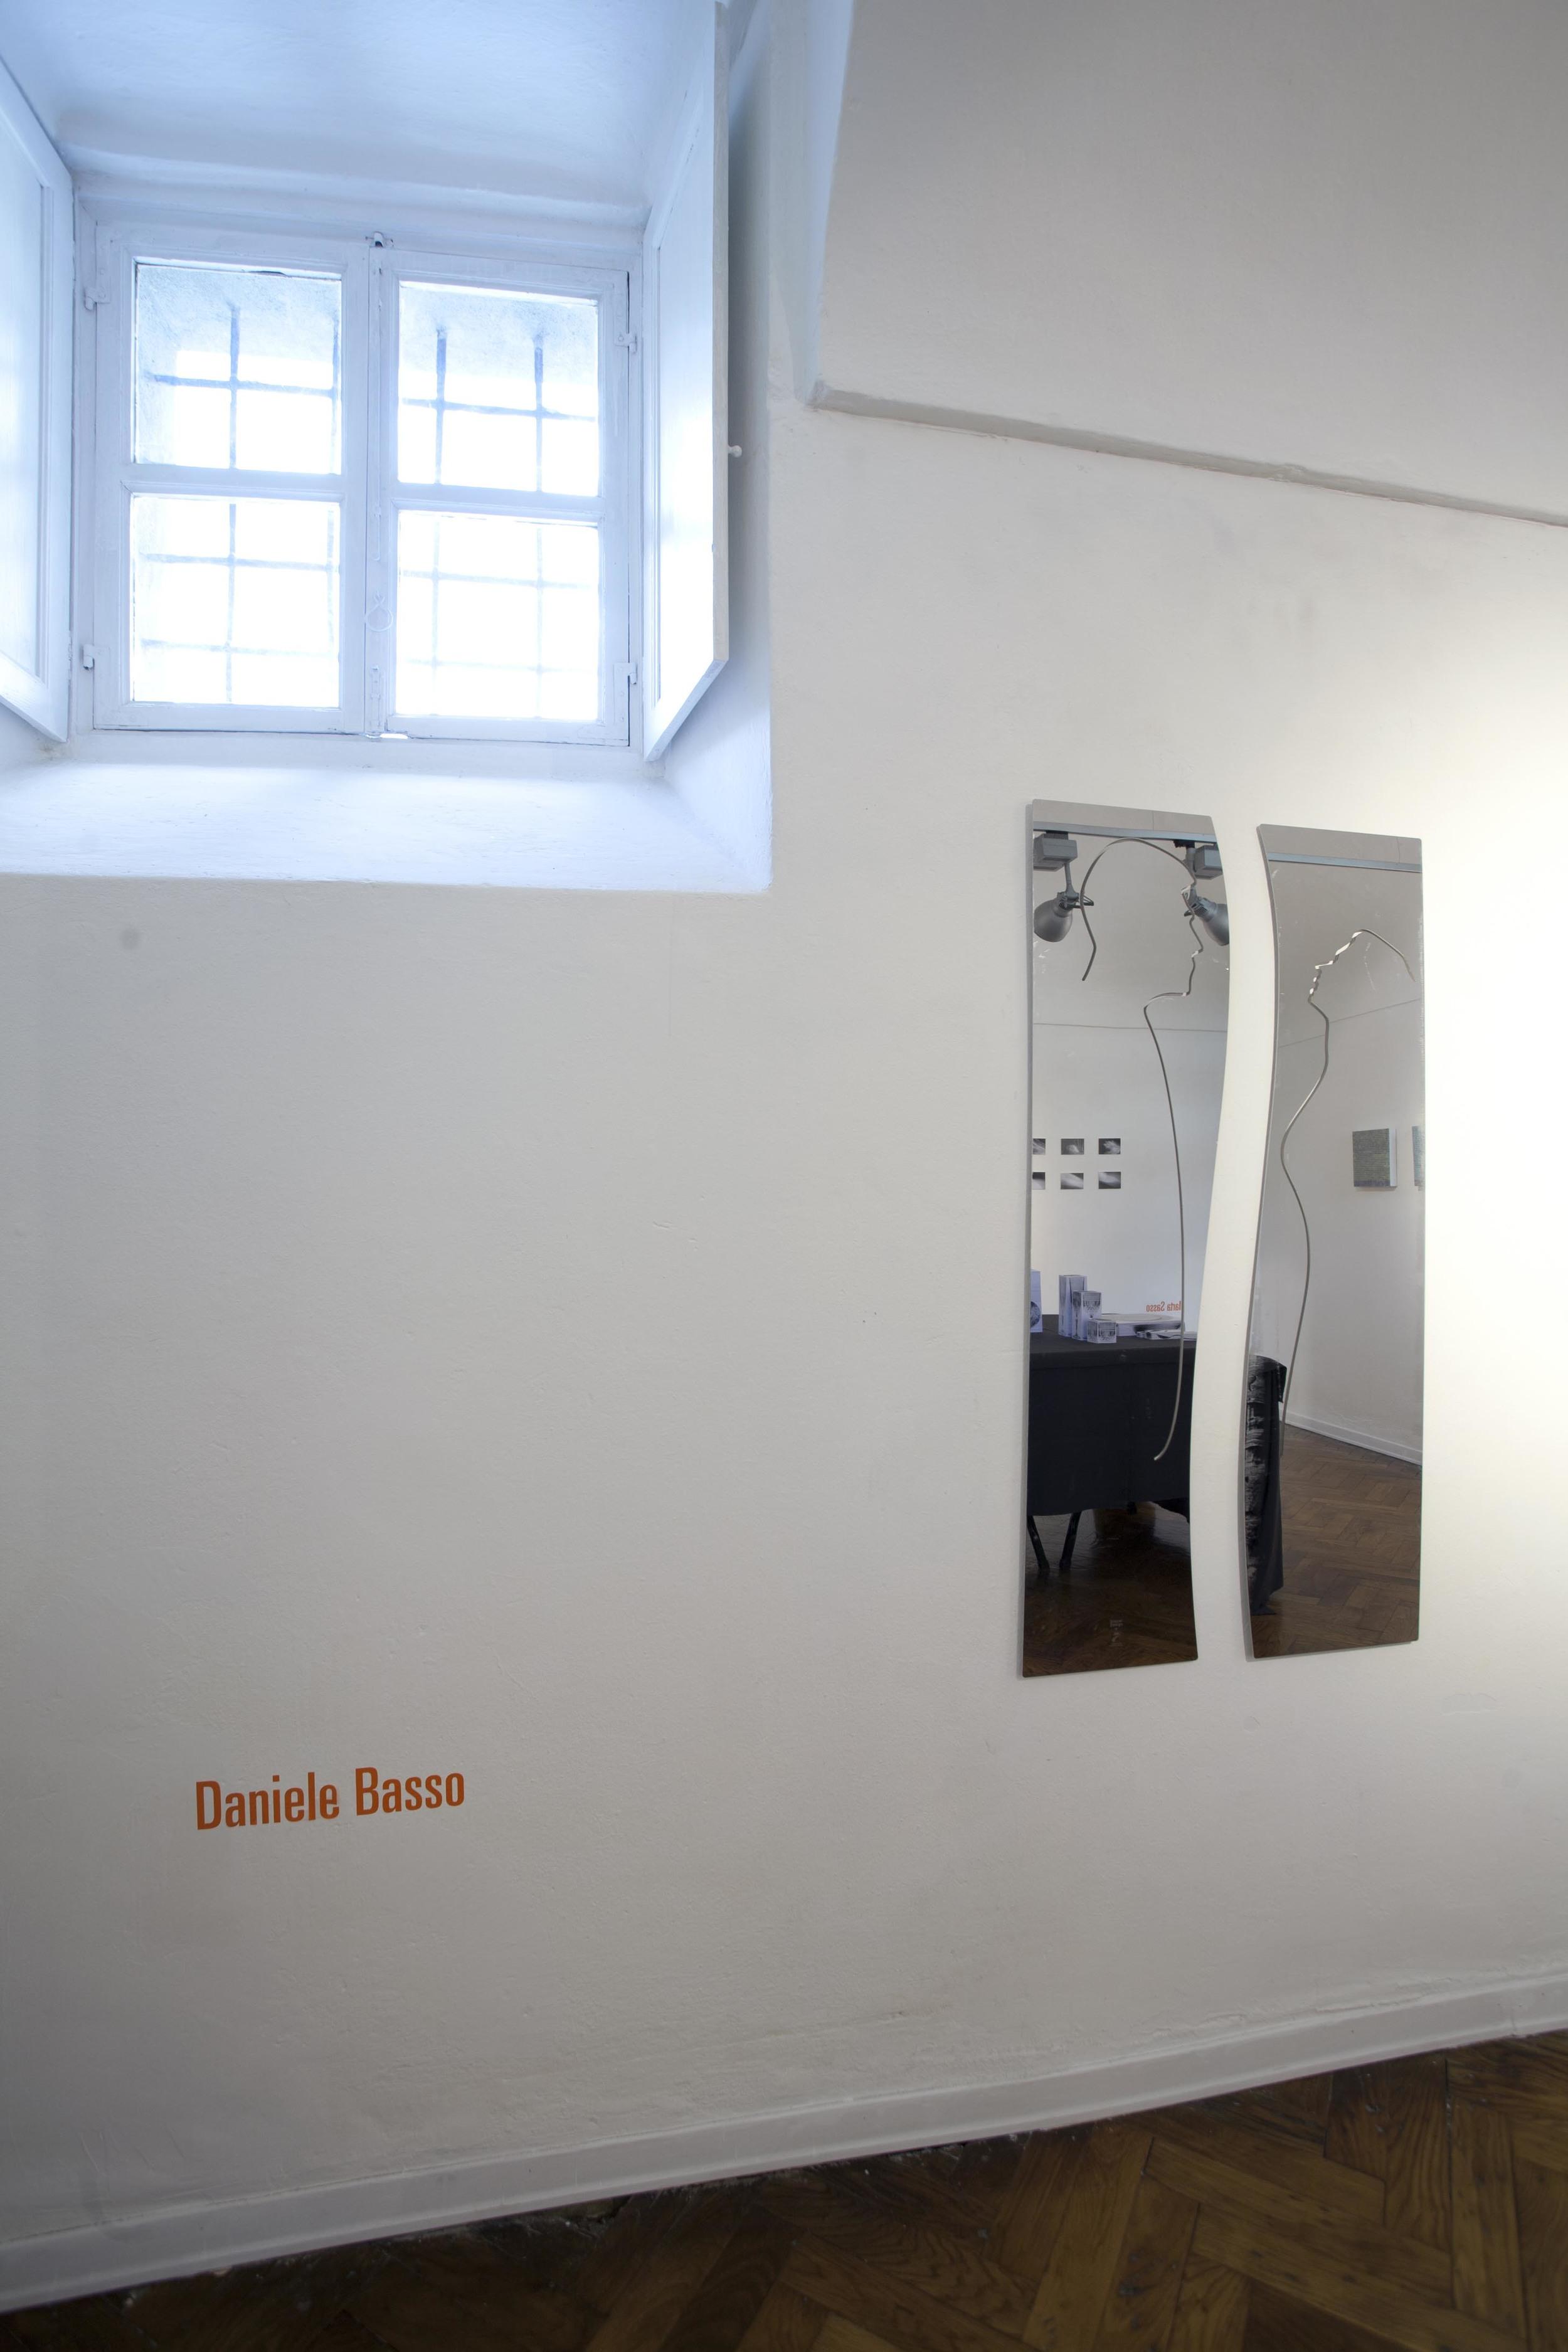 Daniele Basso